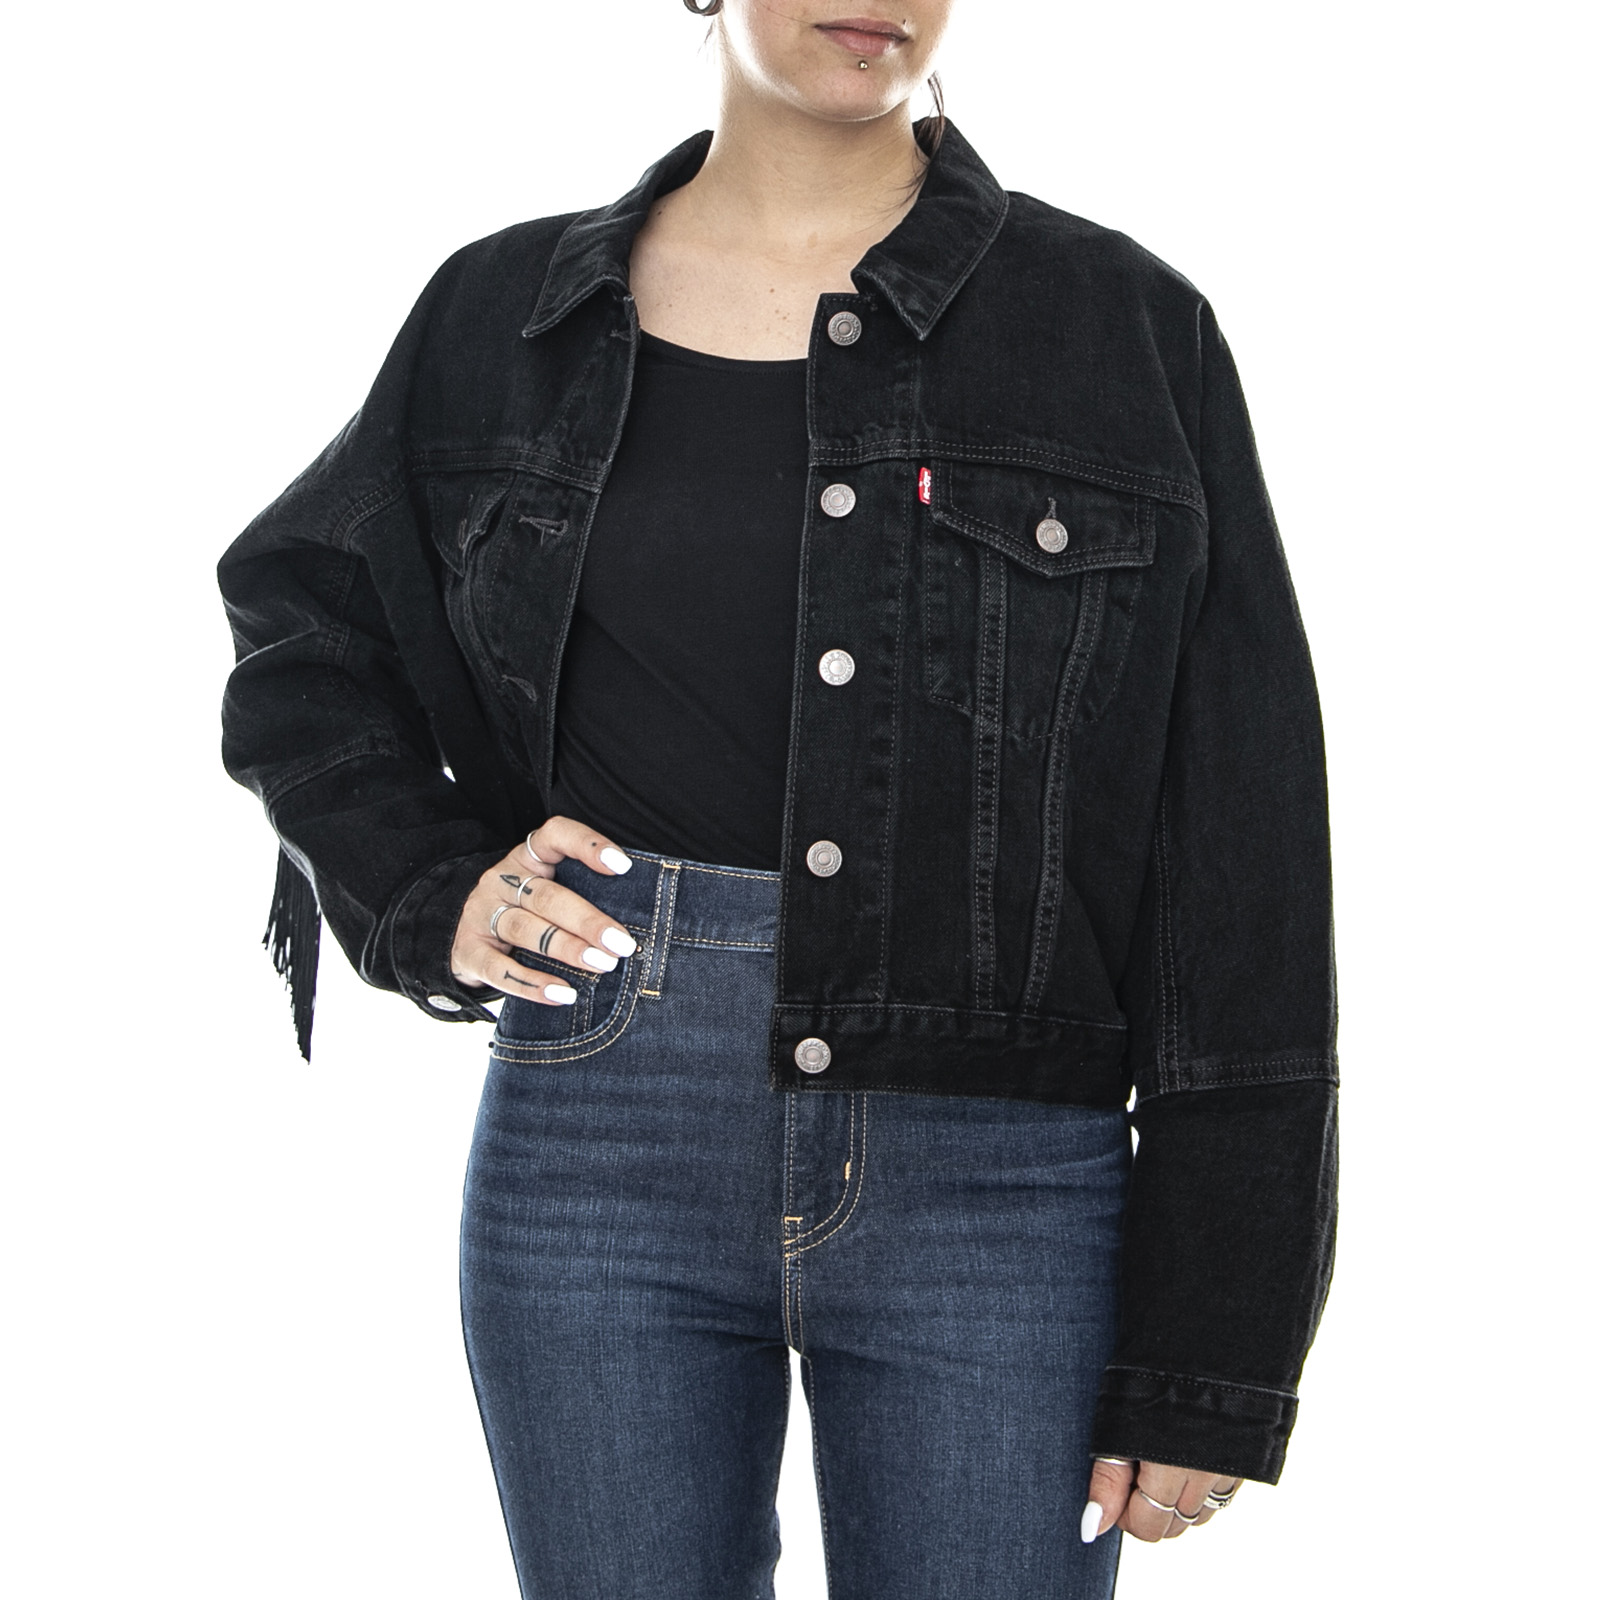 Veste en jean levis femme noir